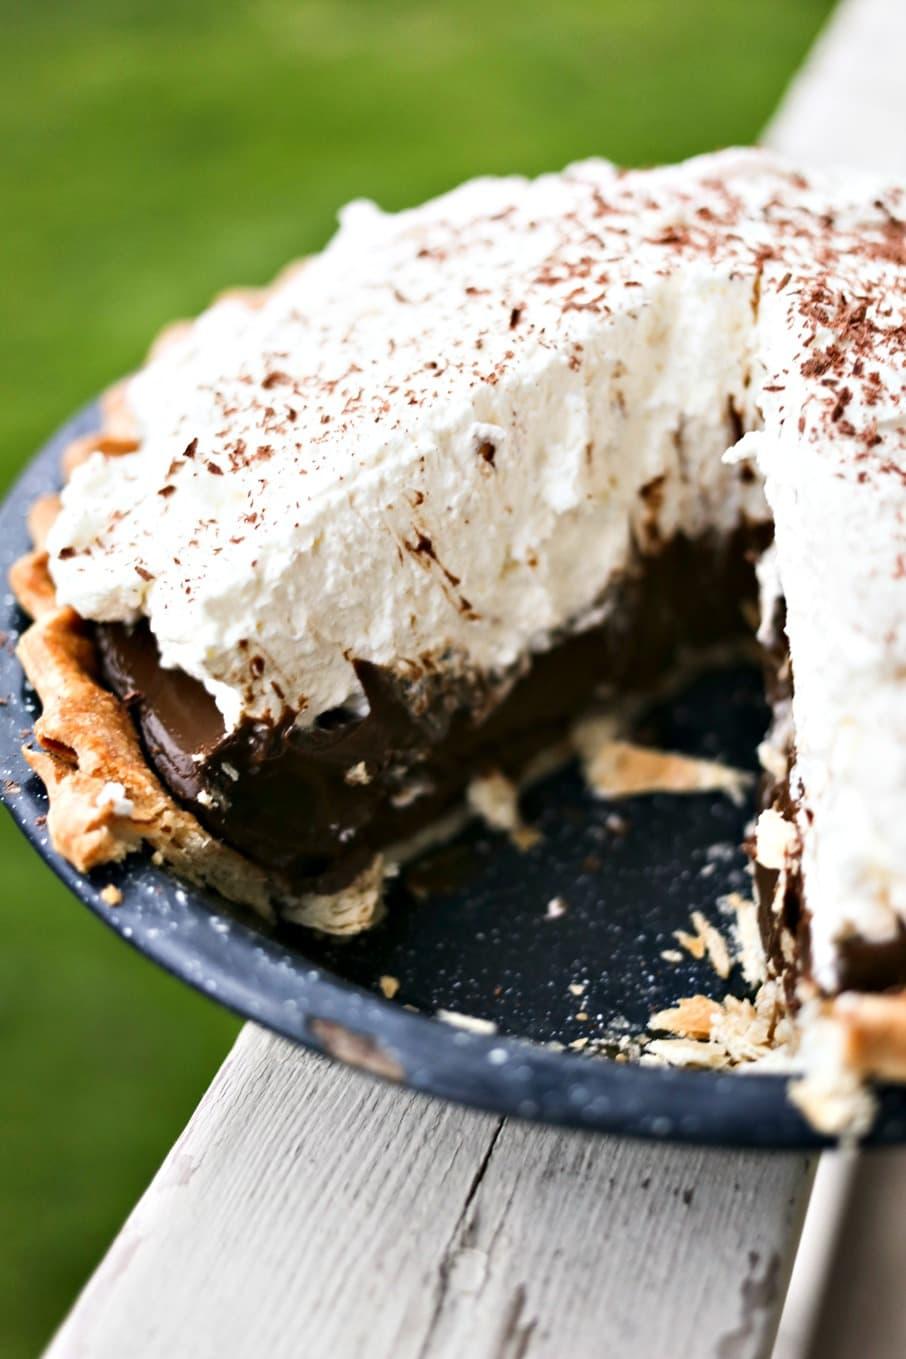 Kahlua Chocolate Cream Pie chocolate pudding, homemade whipped cream, cocoa dusting